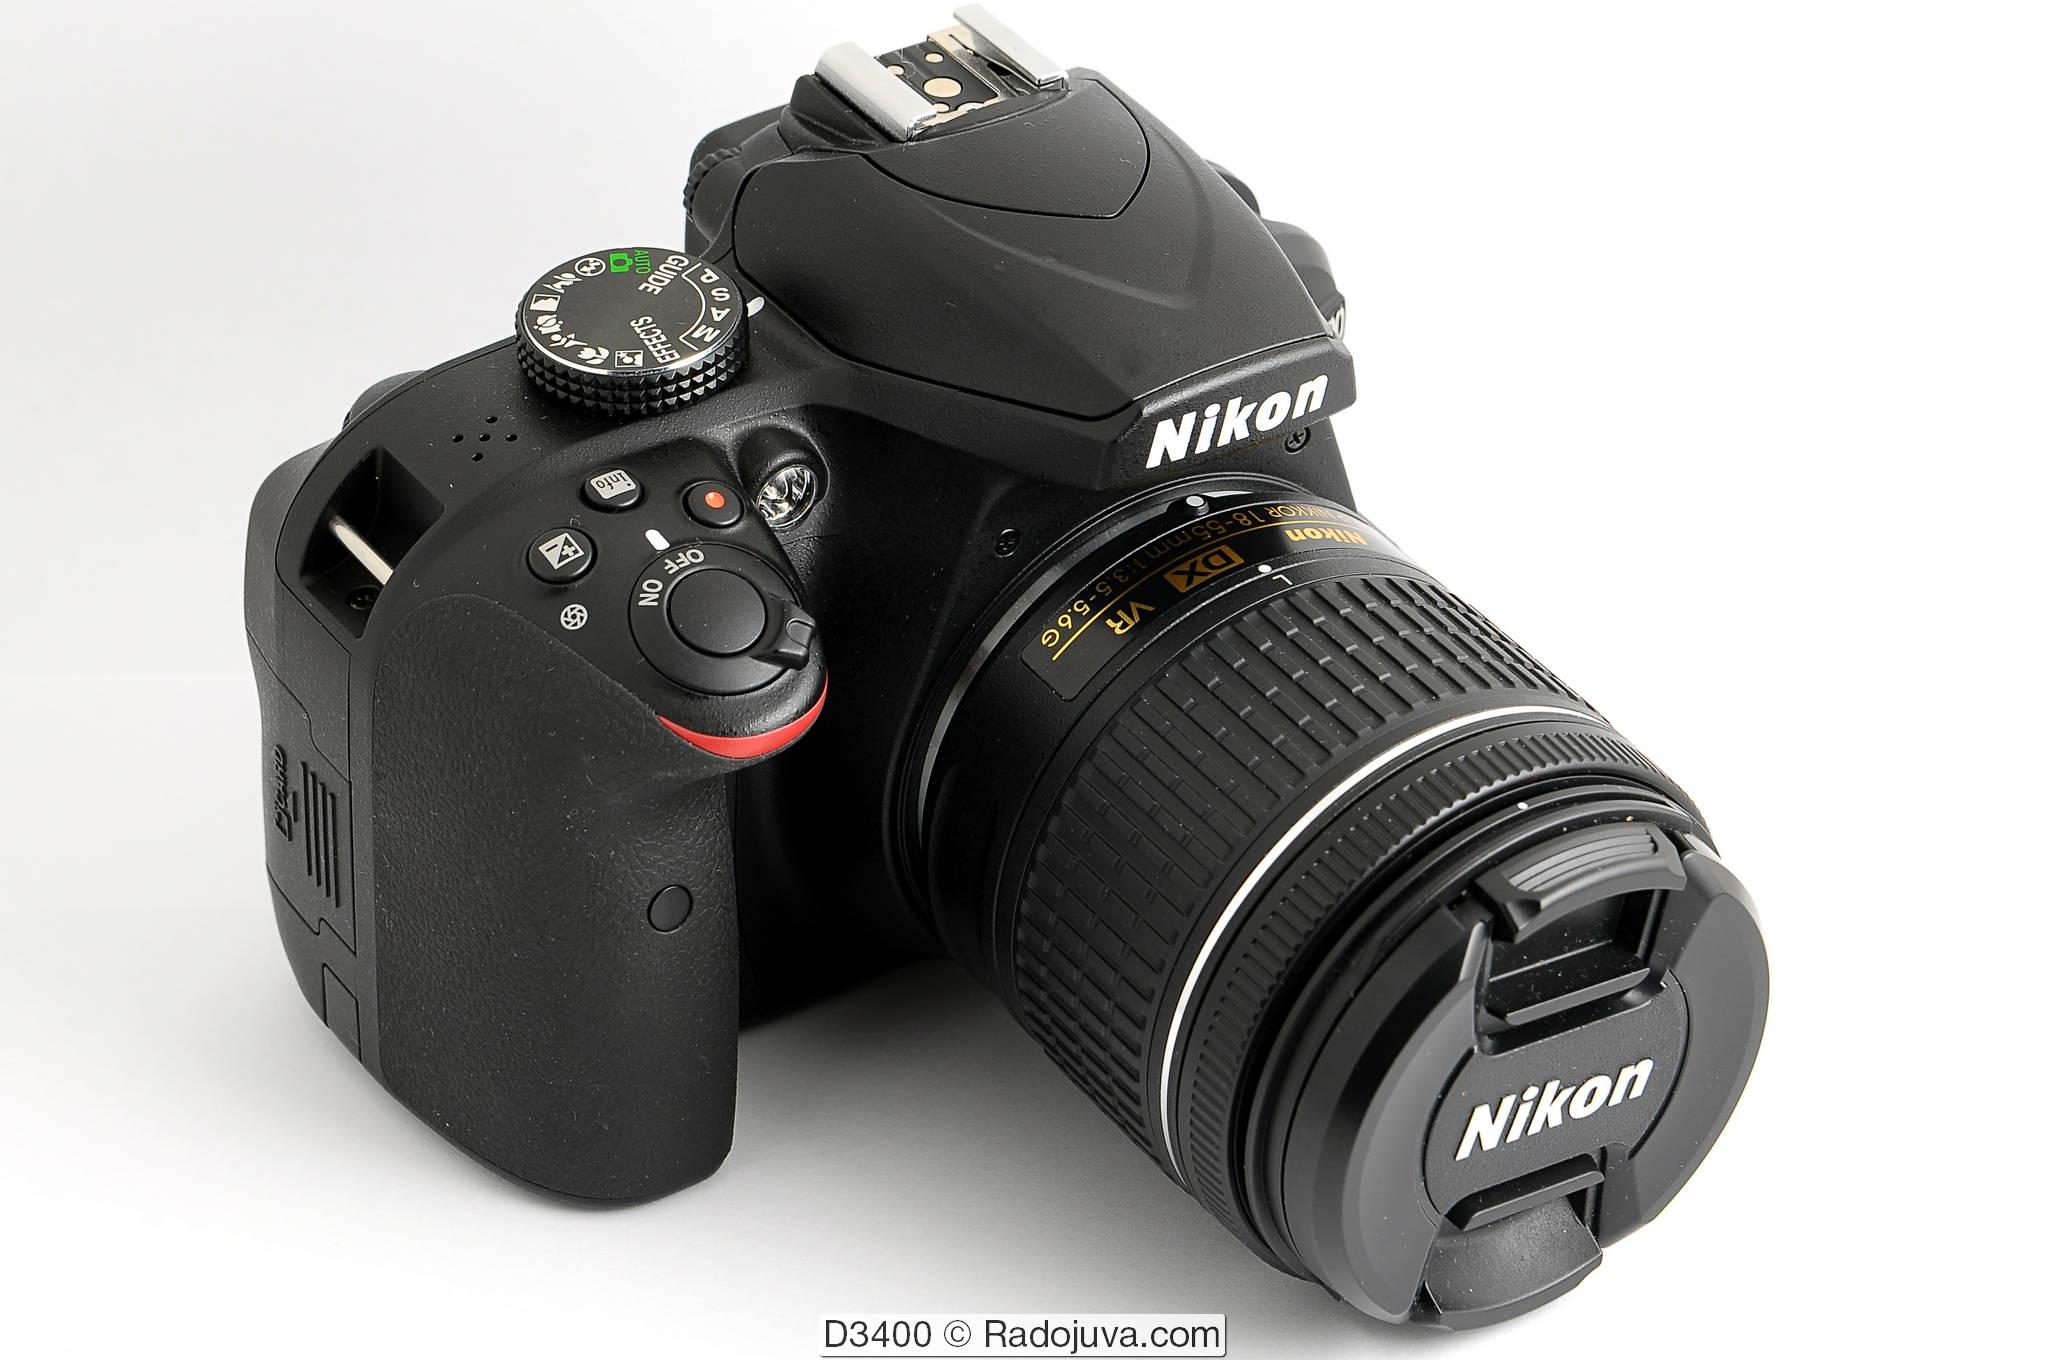 Nikon D3400 с объективом Nikon DX VR AF-P Nikkor 18-55mm 1:3.5-5.6G